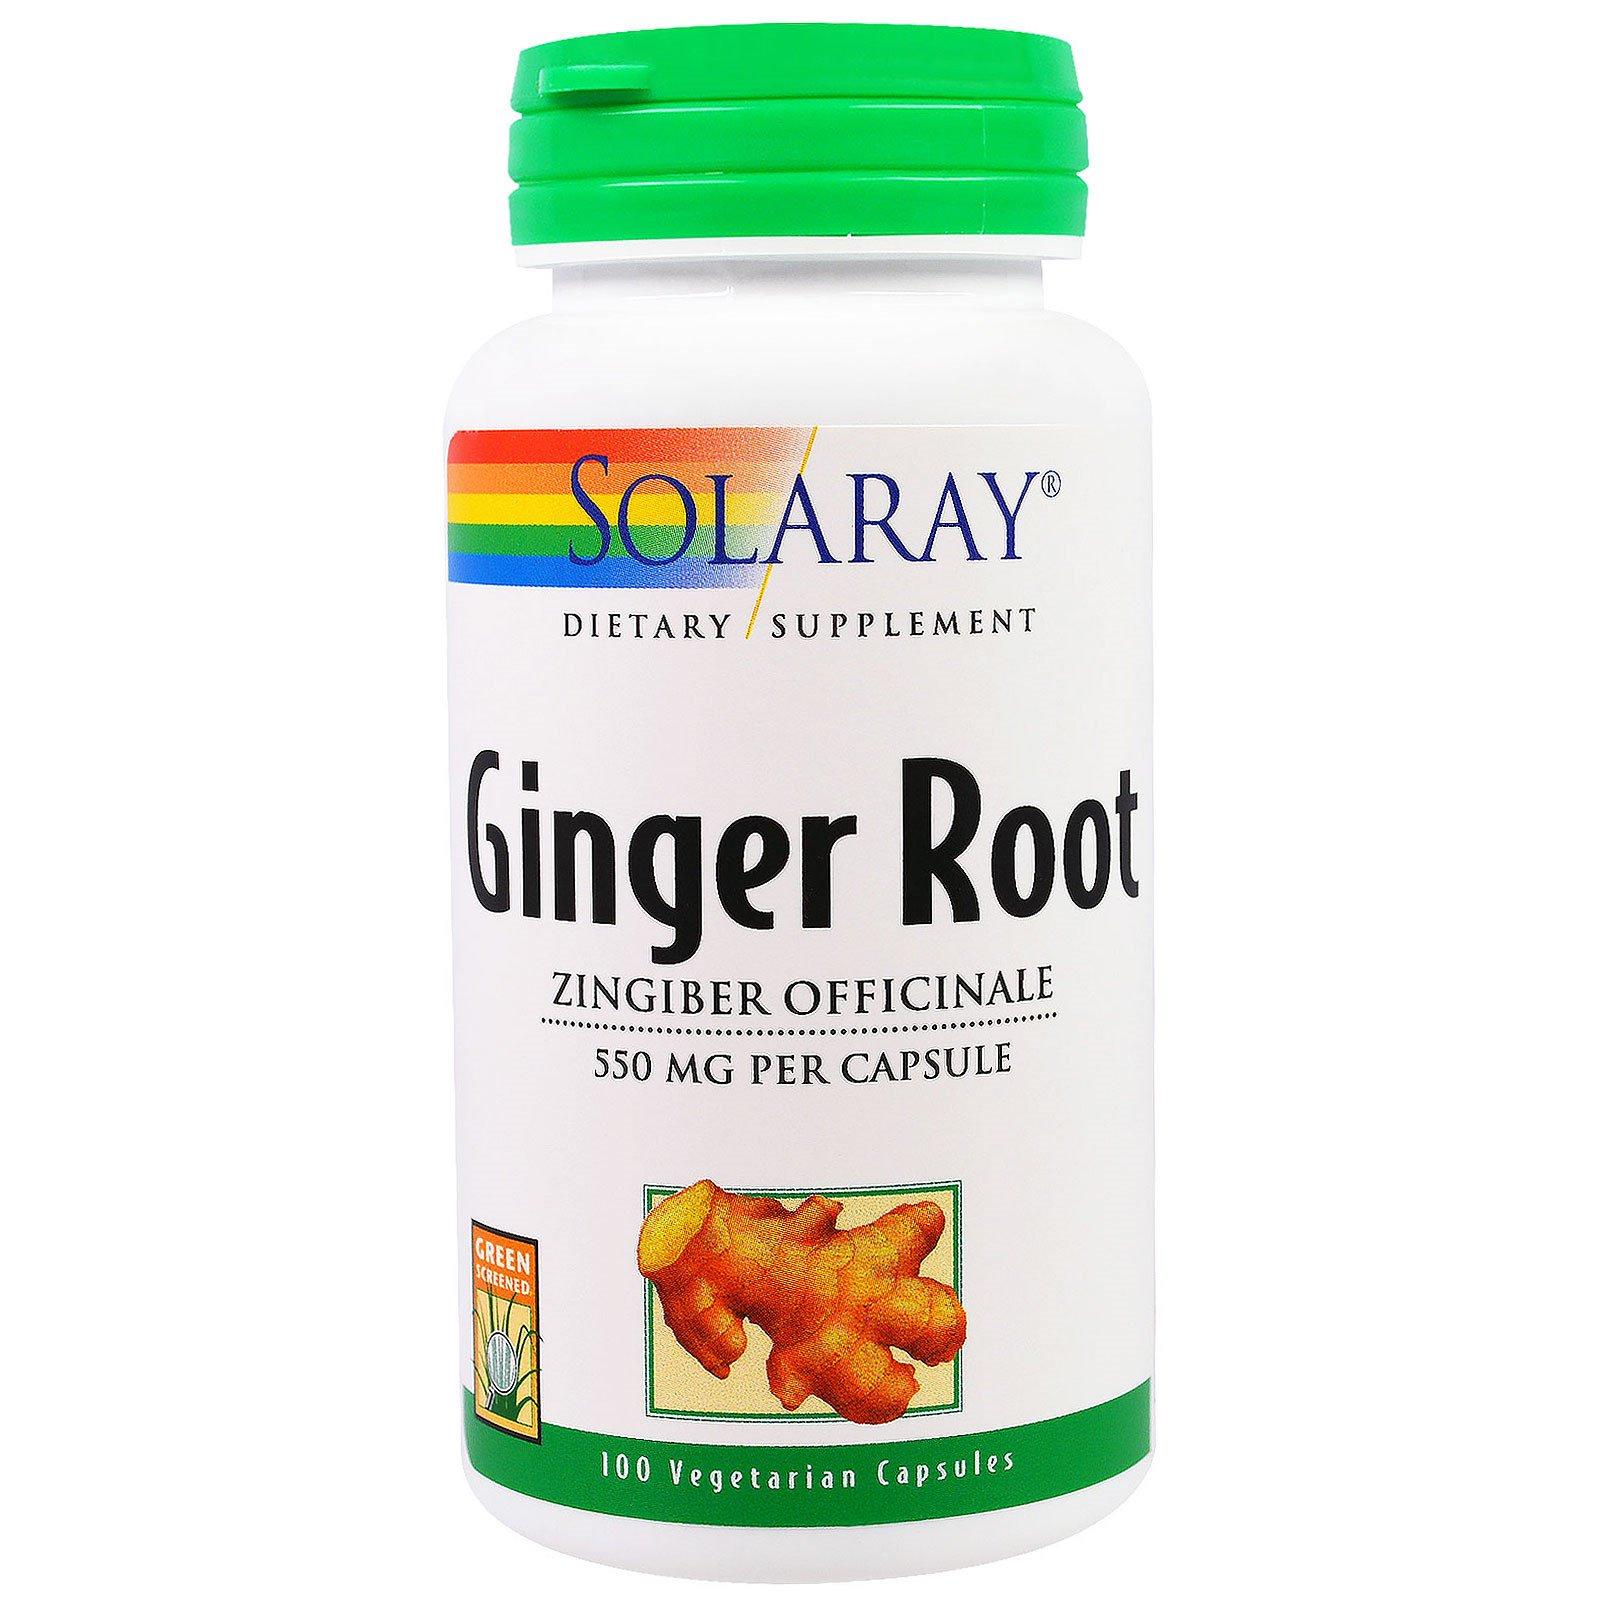 Solaray, Корень имбиря, 550 мг, 100 вегетарианских капсул